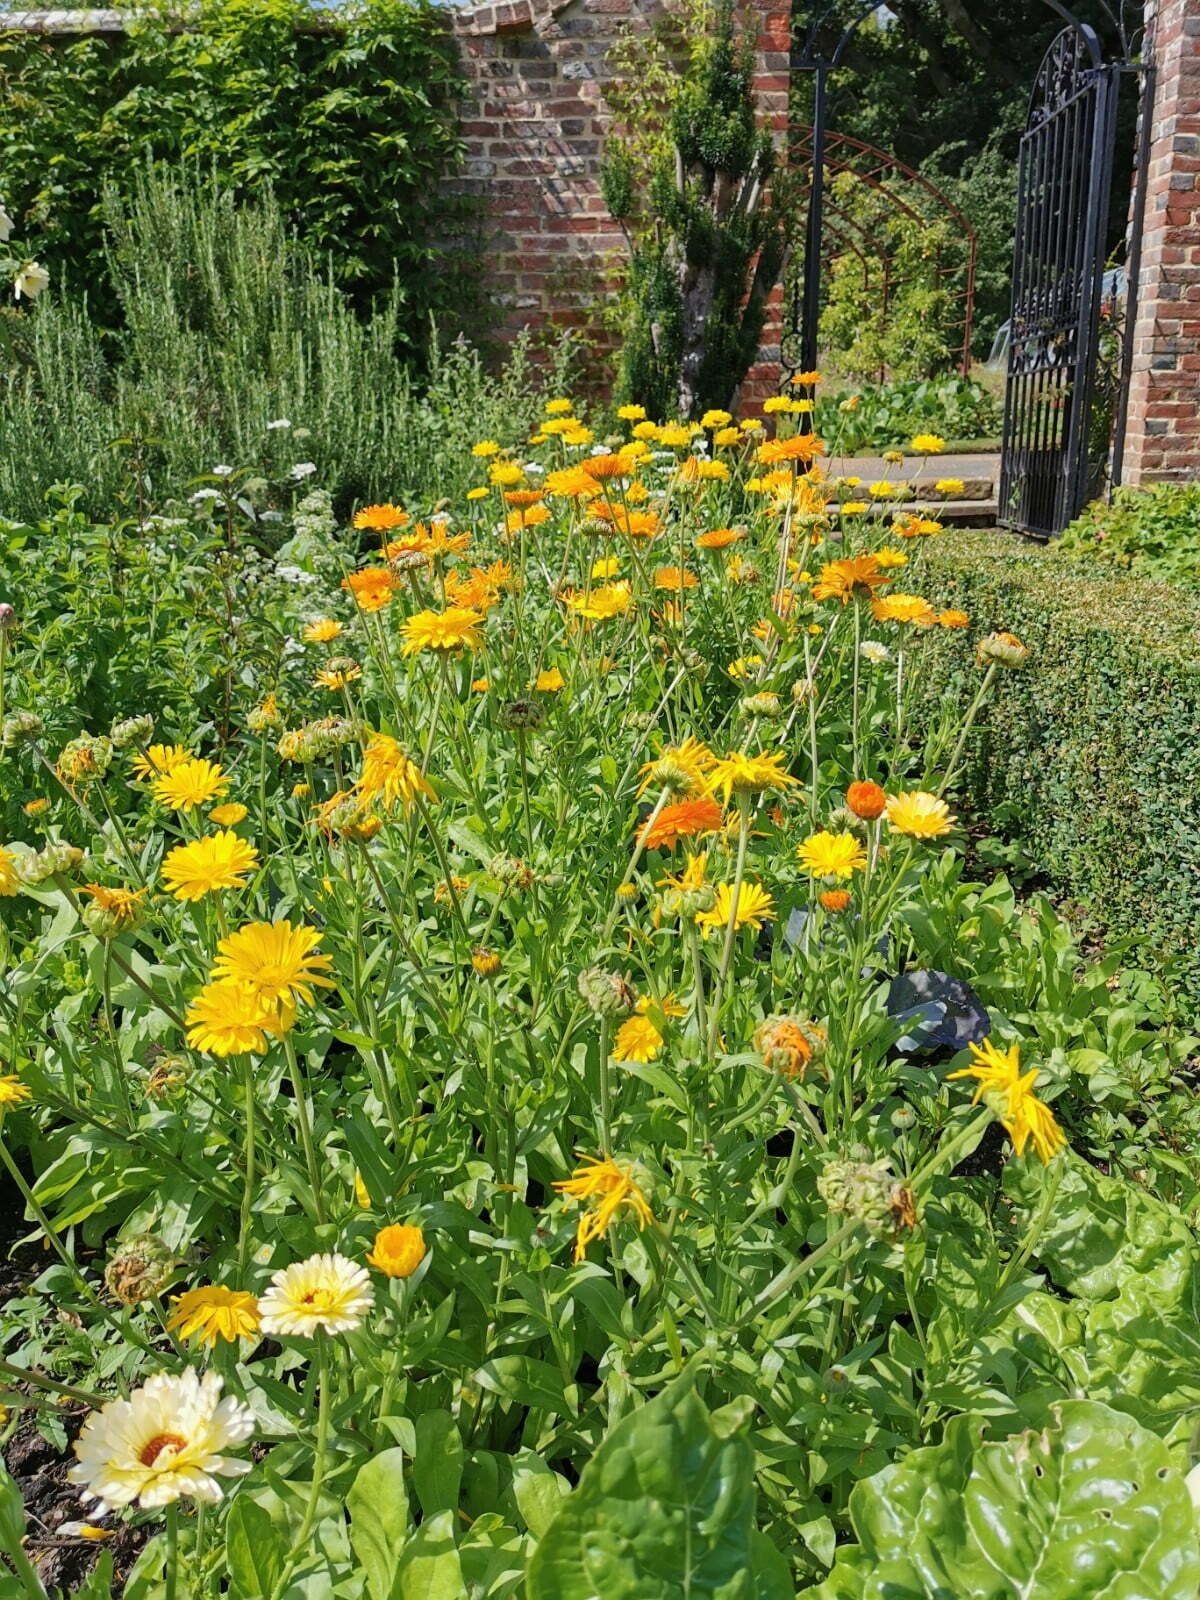 Bateman's Garden: A Kaleidoscope of Colours at Rudyard Kipling's National Trust Home 12